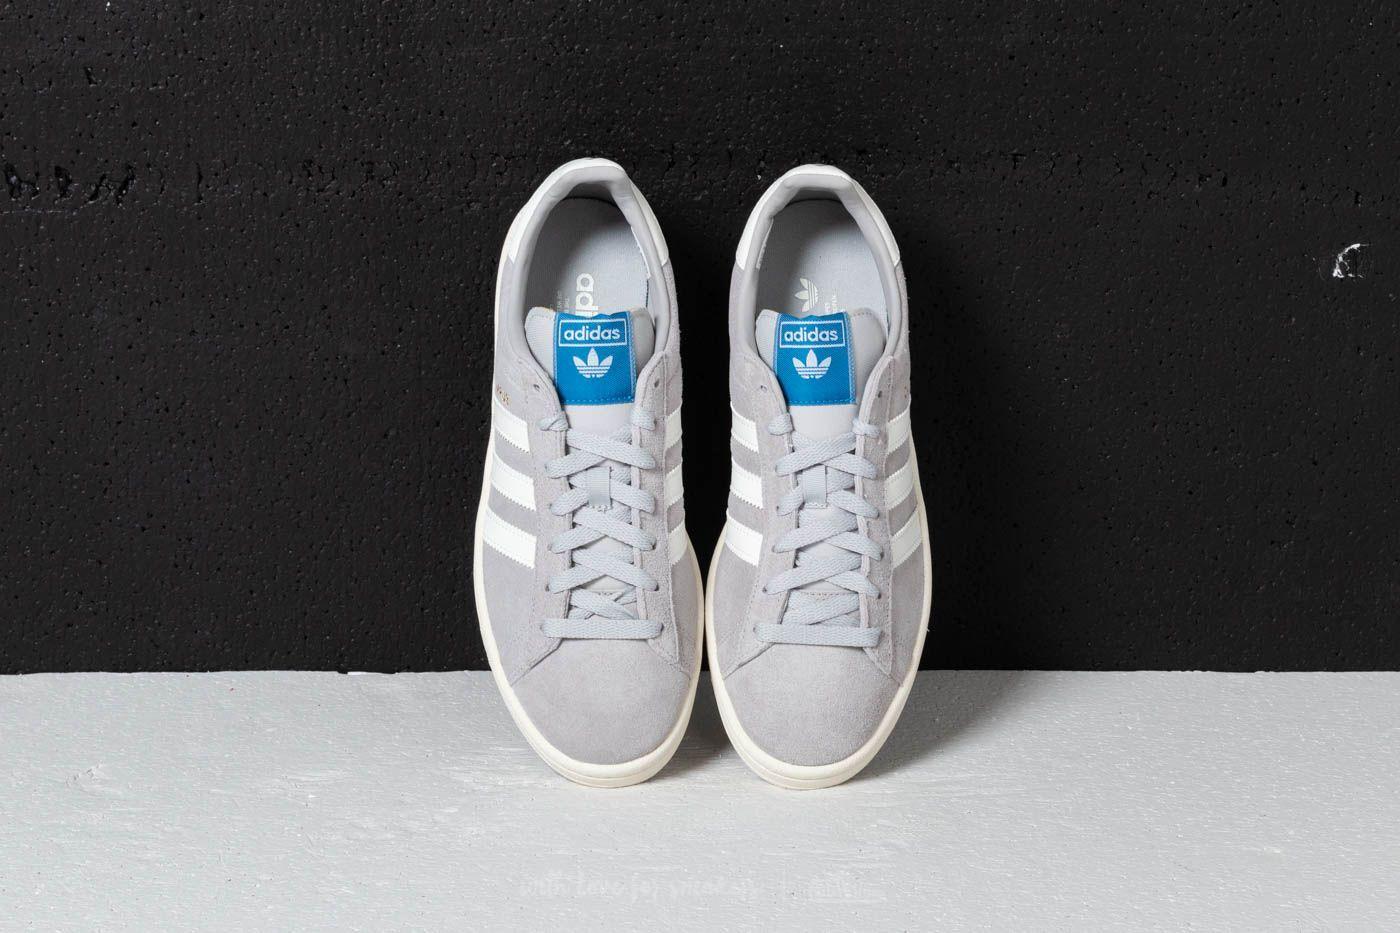 patrón dedo adverbio  adidas Campus Grey Two/ Cloud White/ Chalk White | Footshop | Adidas campus,  Chalk white, Adidas